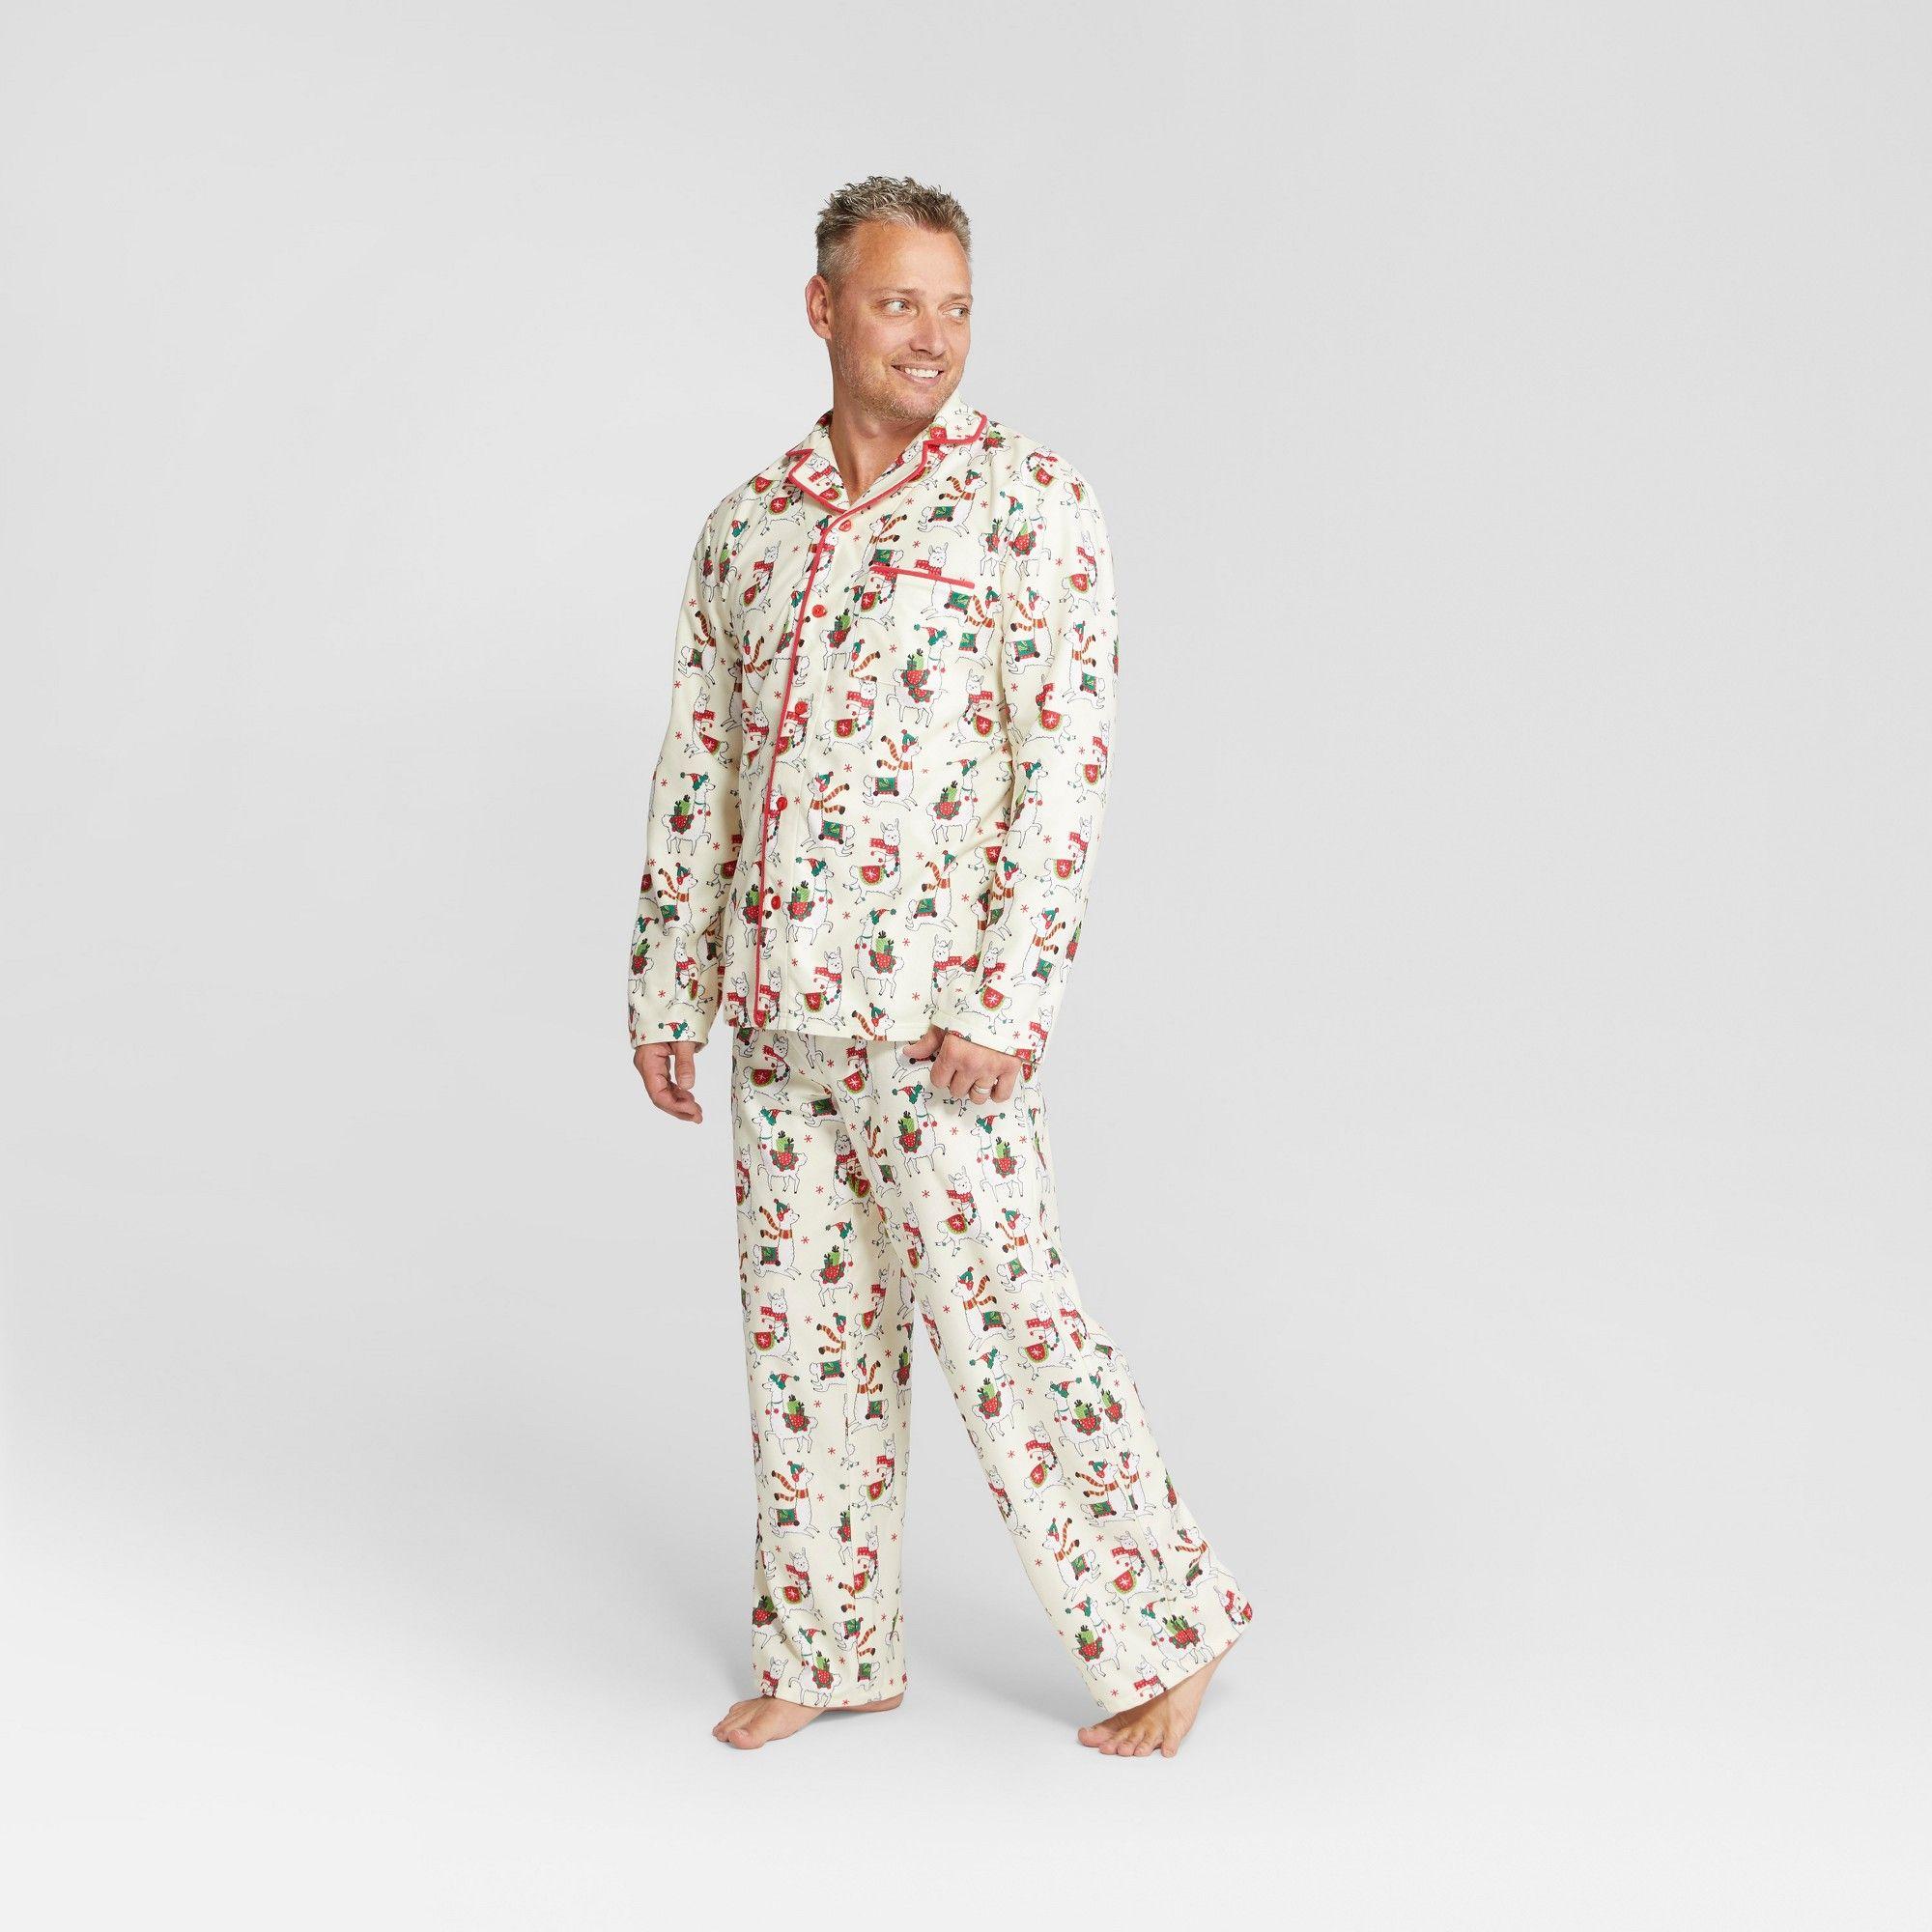 1bde27786c Nite Nite Munki Munki Men s Holiday Llama Notch Collar Pajama Set - Ivory  2XL